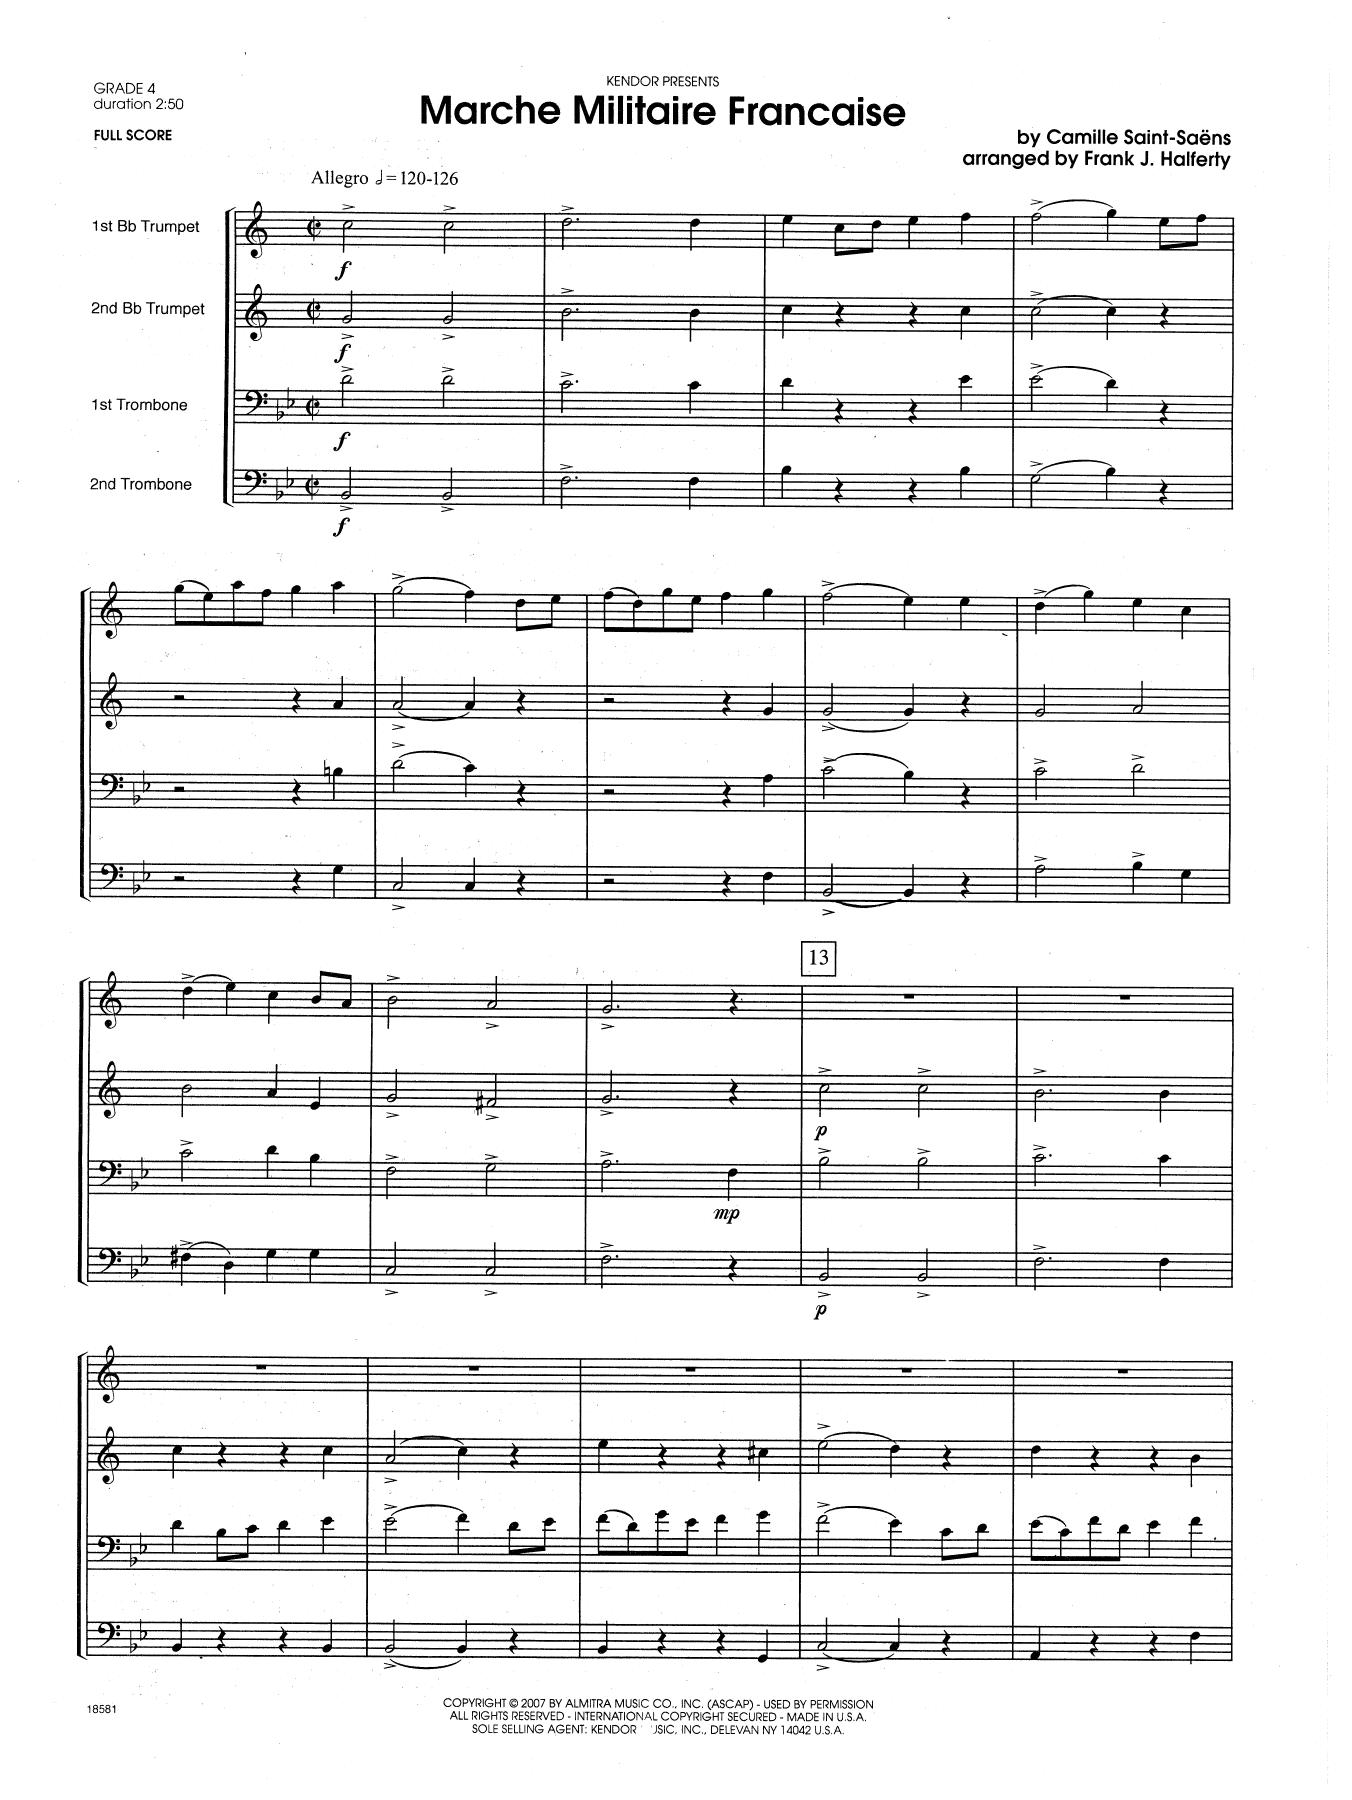 Marche Militaire Francaise (COMPLETE) sheet music for brass quartet by Frank J. Halferty